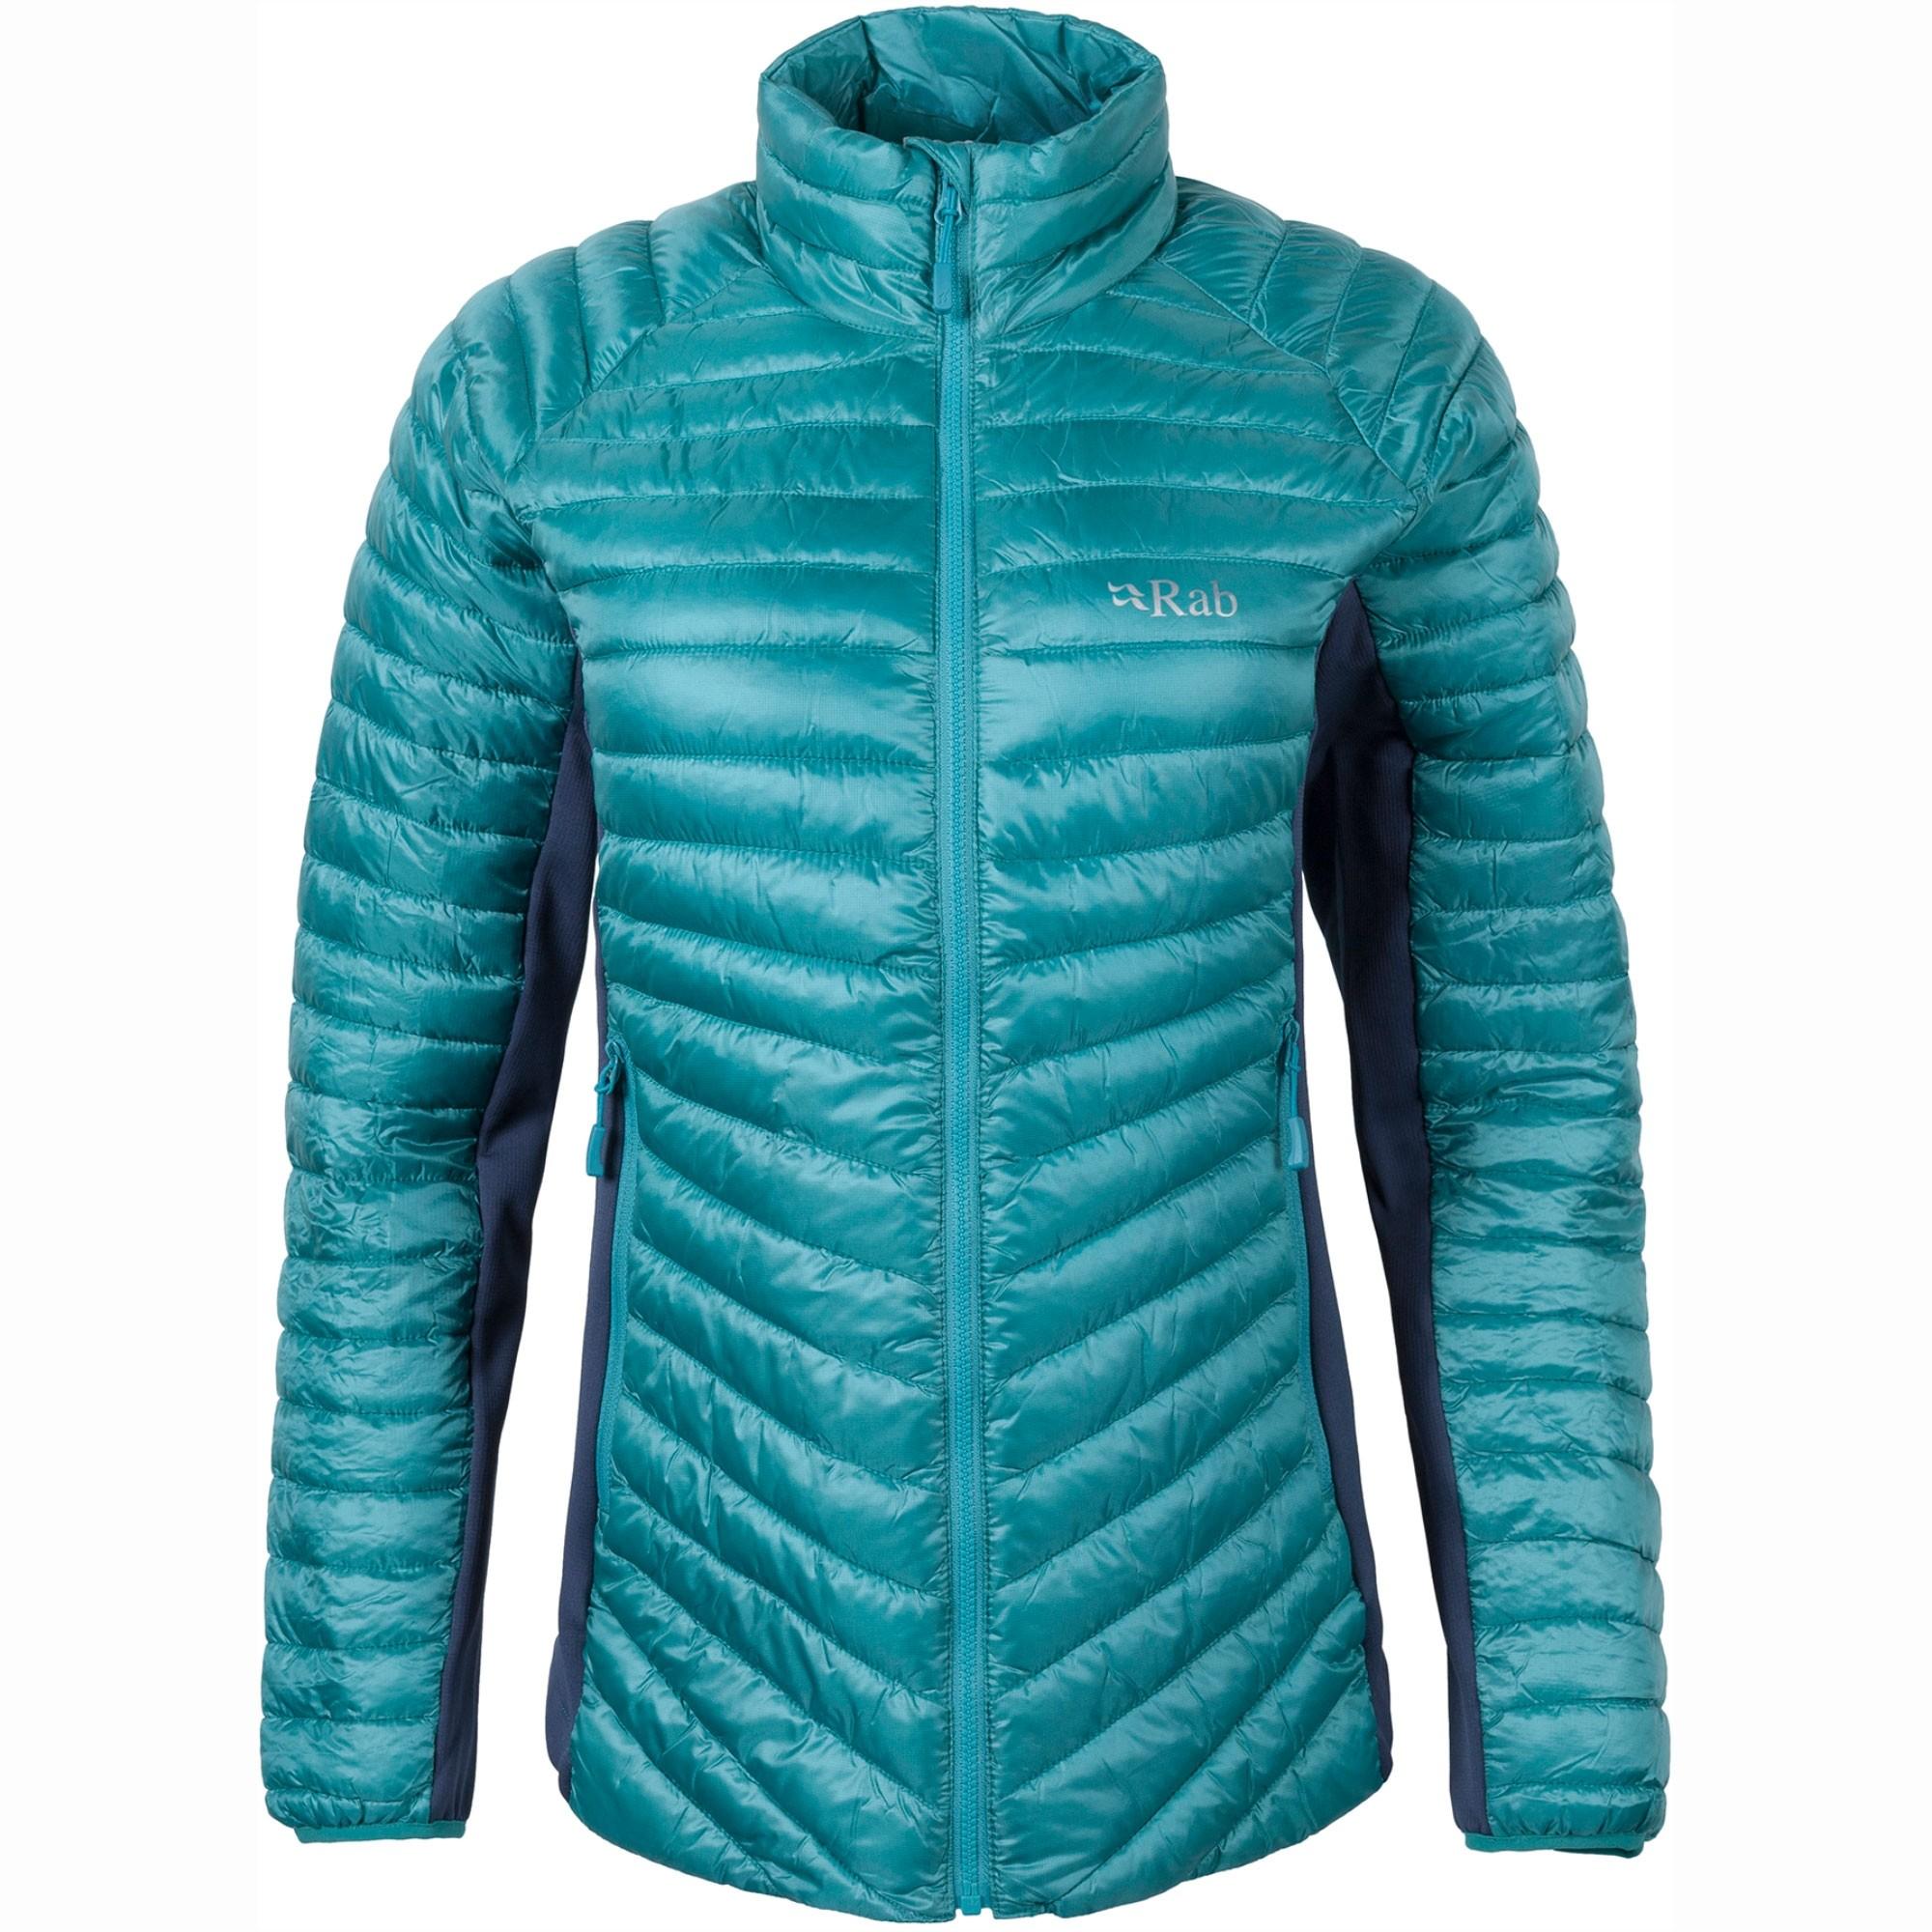 Rab Cirrus Flex Women's Jacket - Serenity